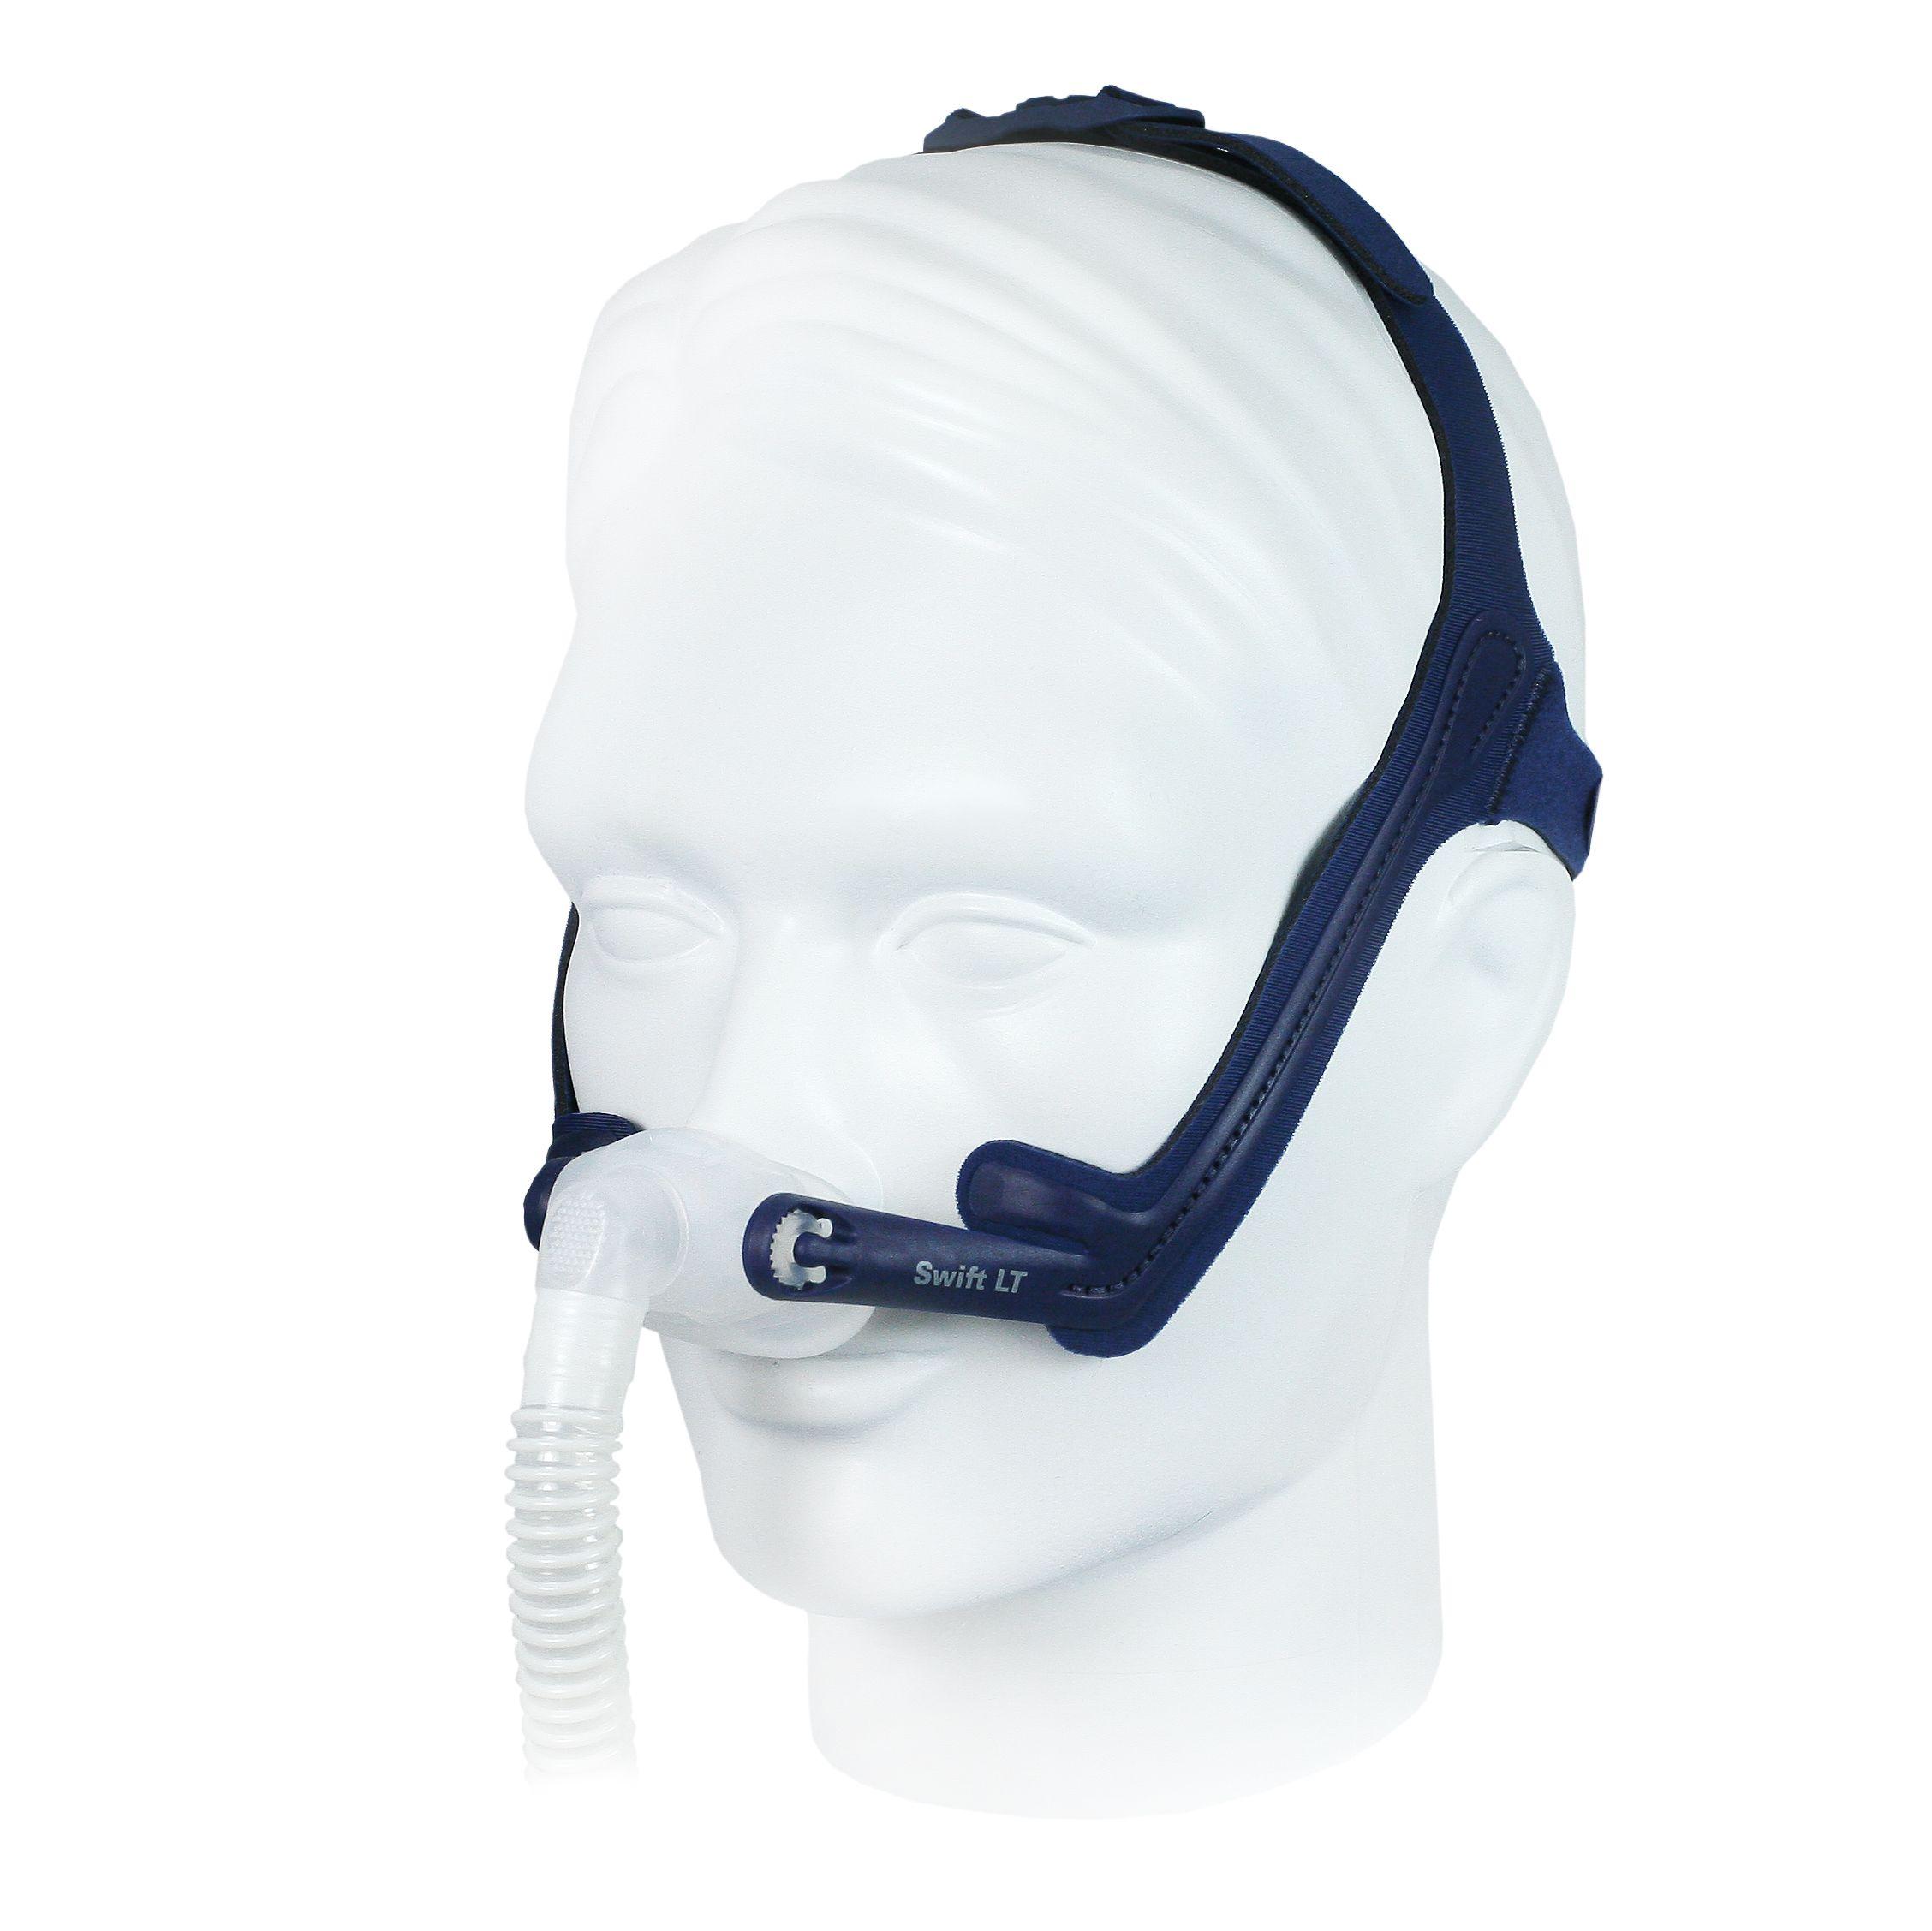 13 nasal pillow cpap masks ideas cpap